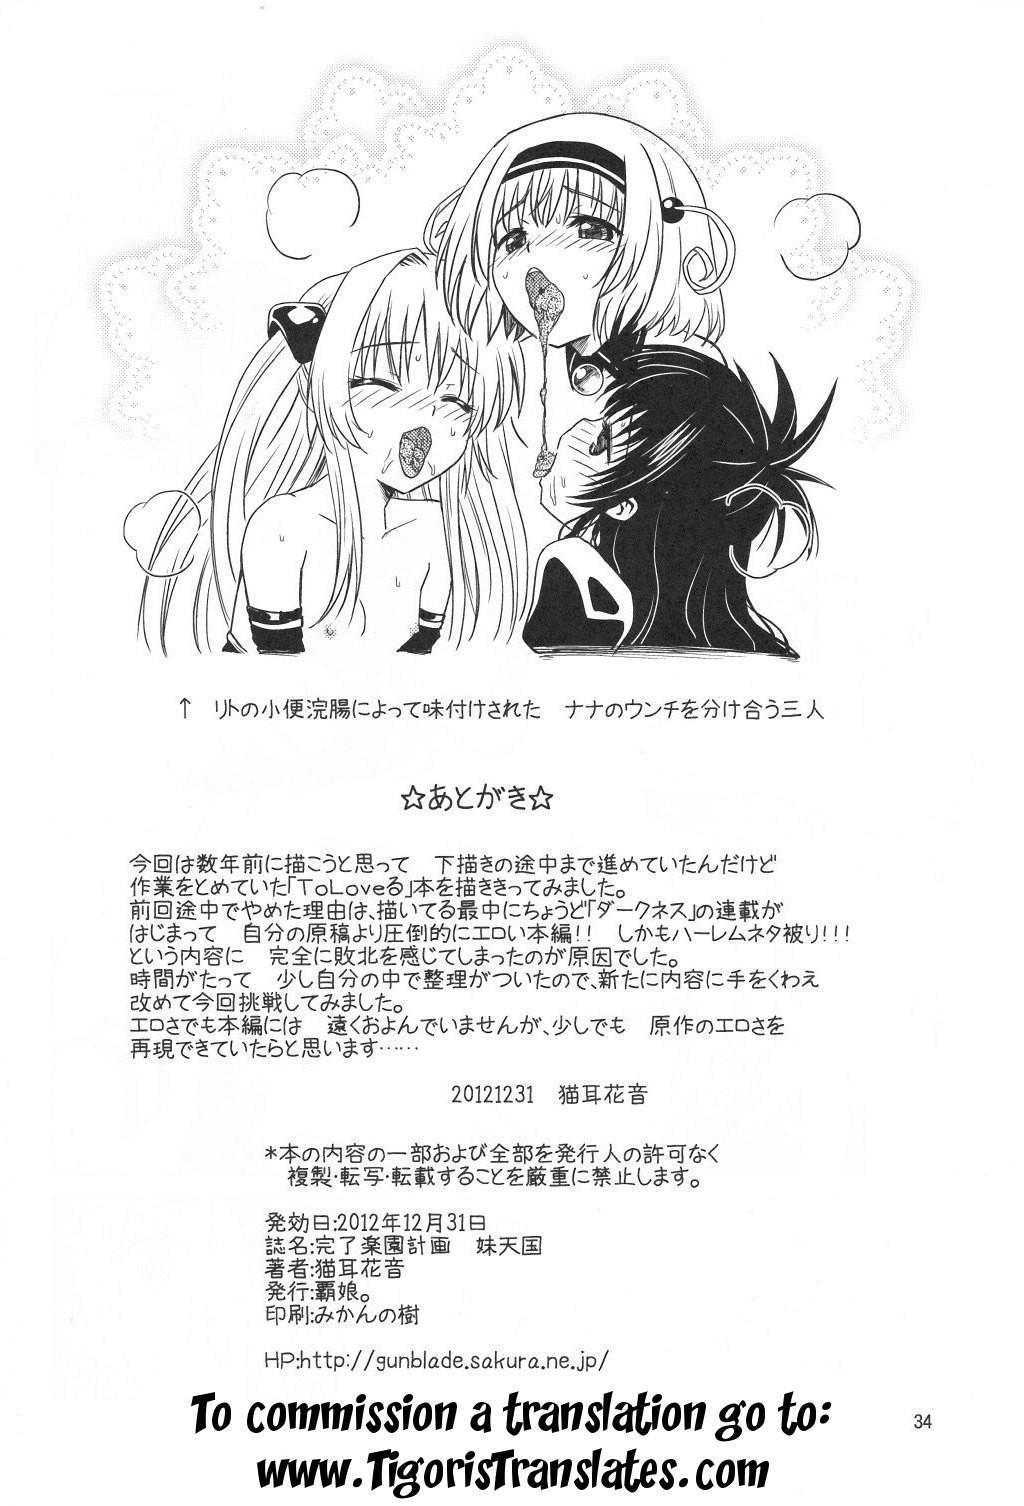 Kanryou Harem Keikaku Imouto Tengoku | Harem Plan Complete - Little Sister Heaven 32